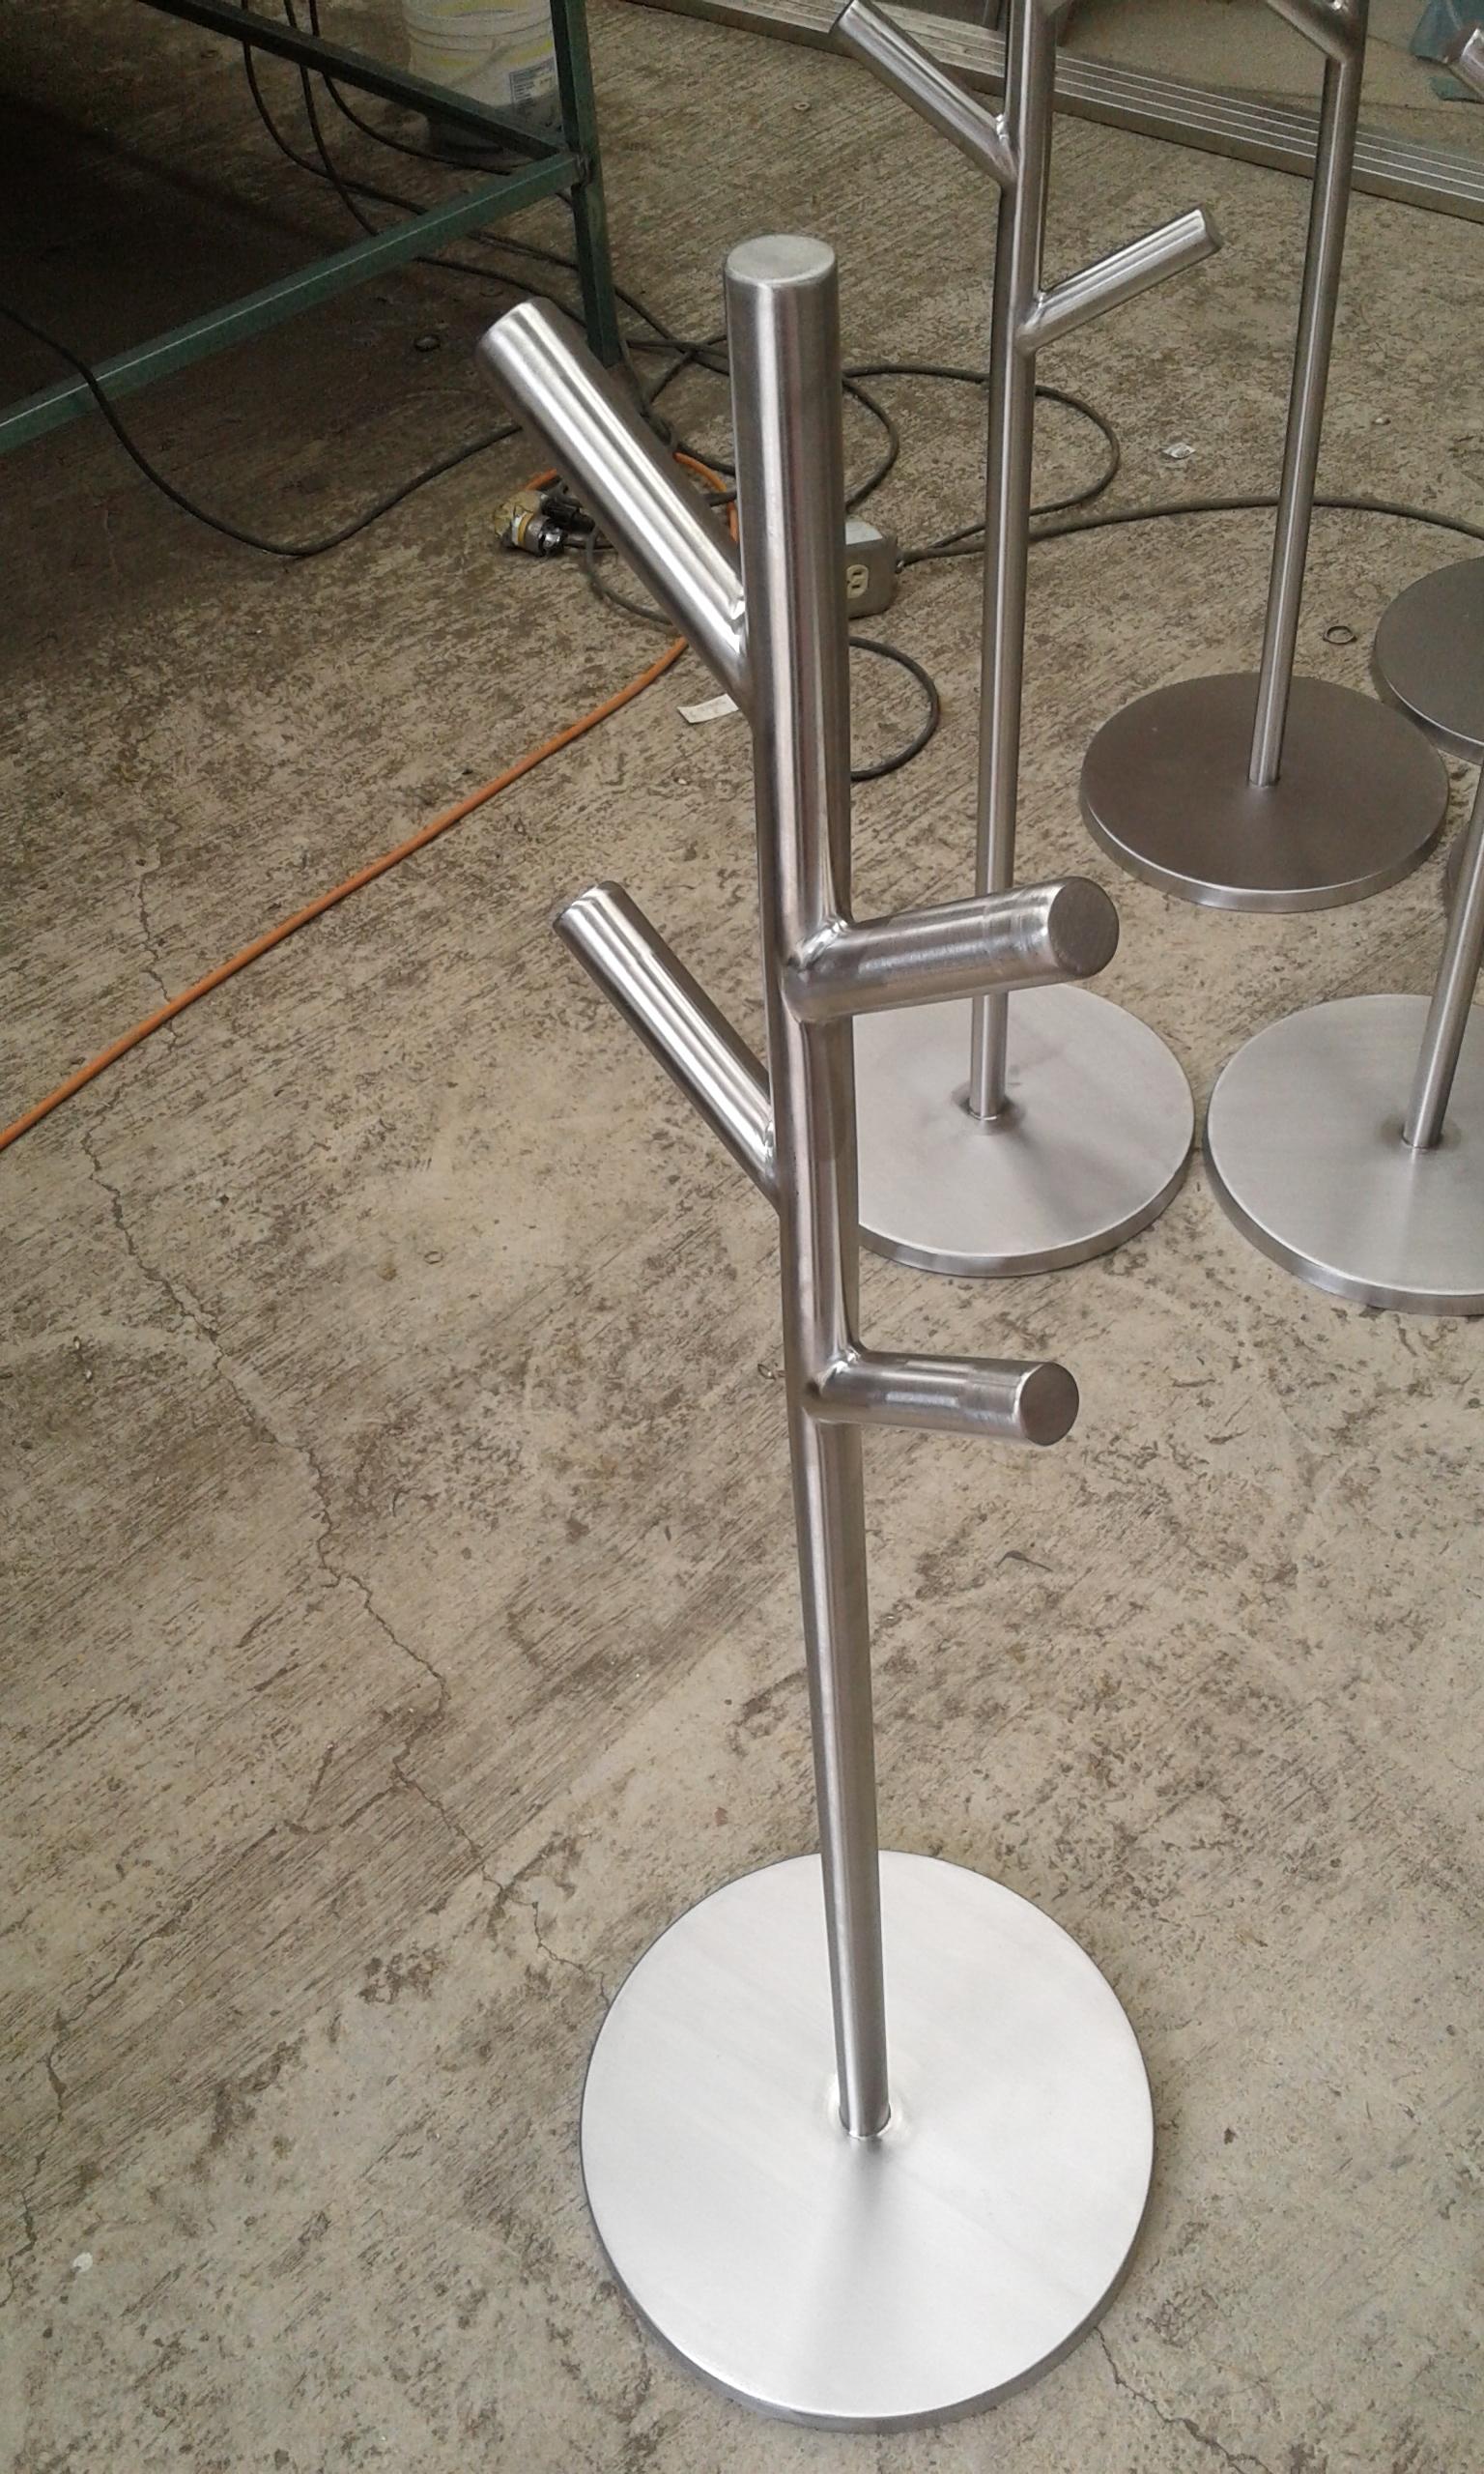 Perchero de pedestal acero inoxidable p gina web de for Percheros de acero inoxidable